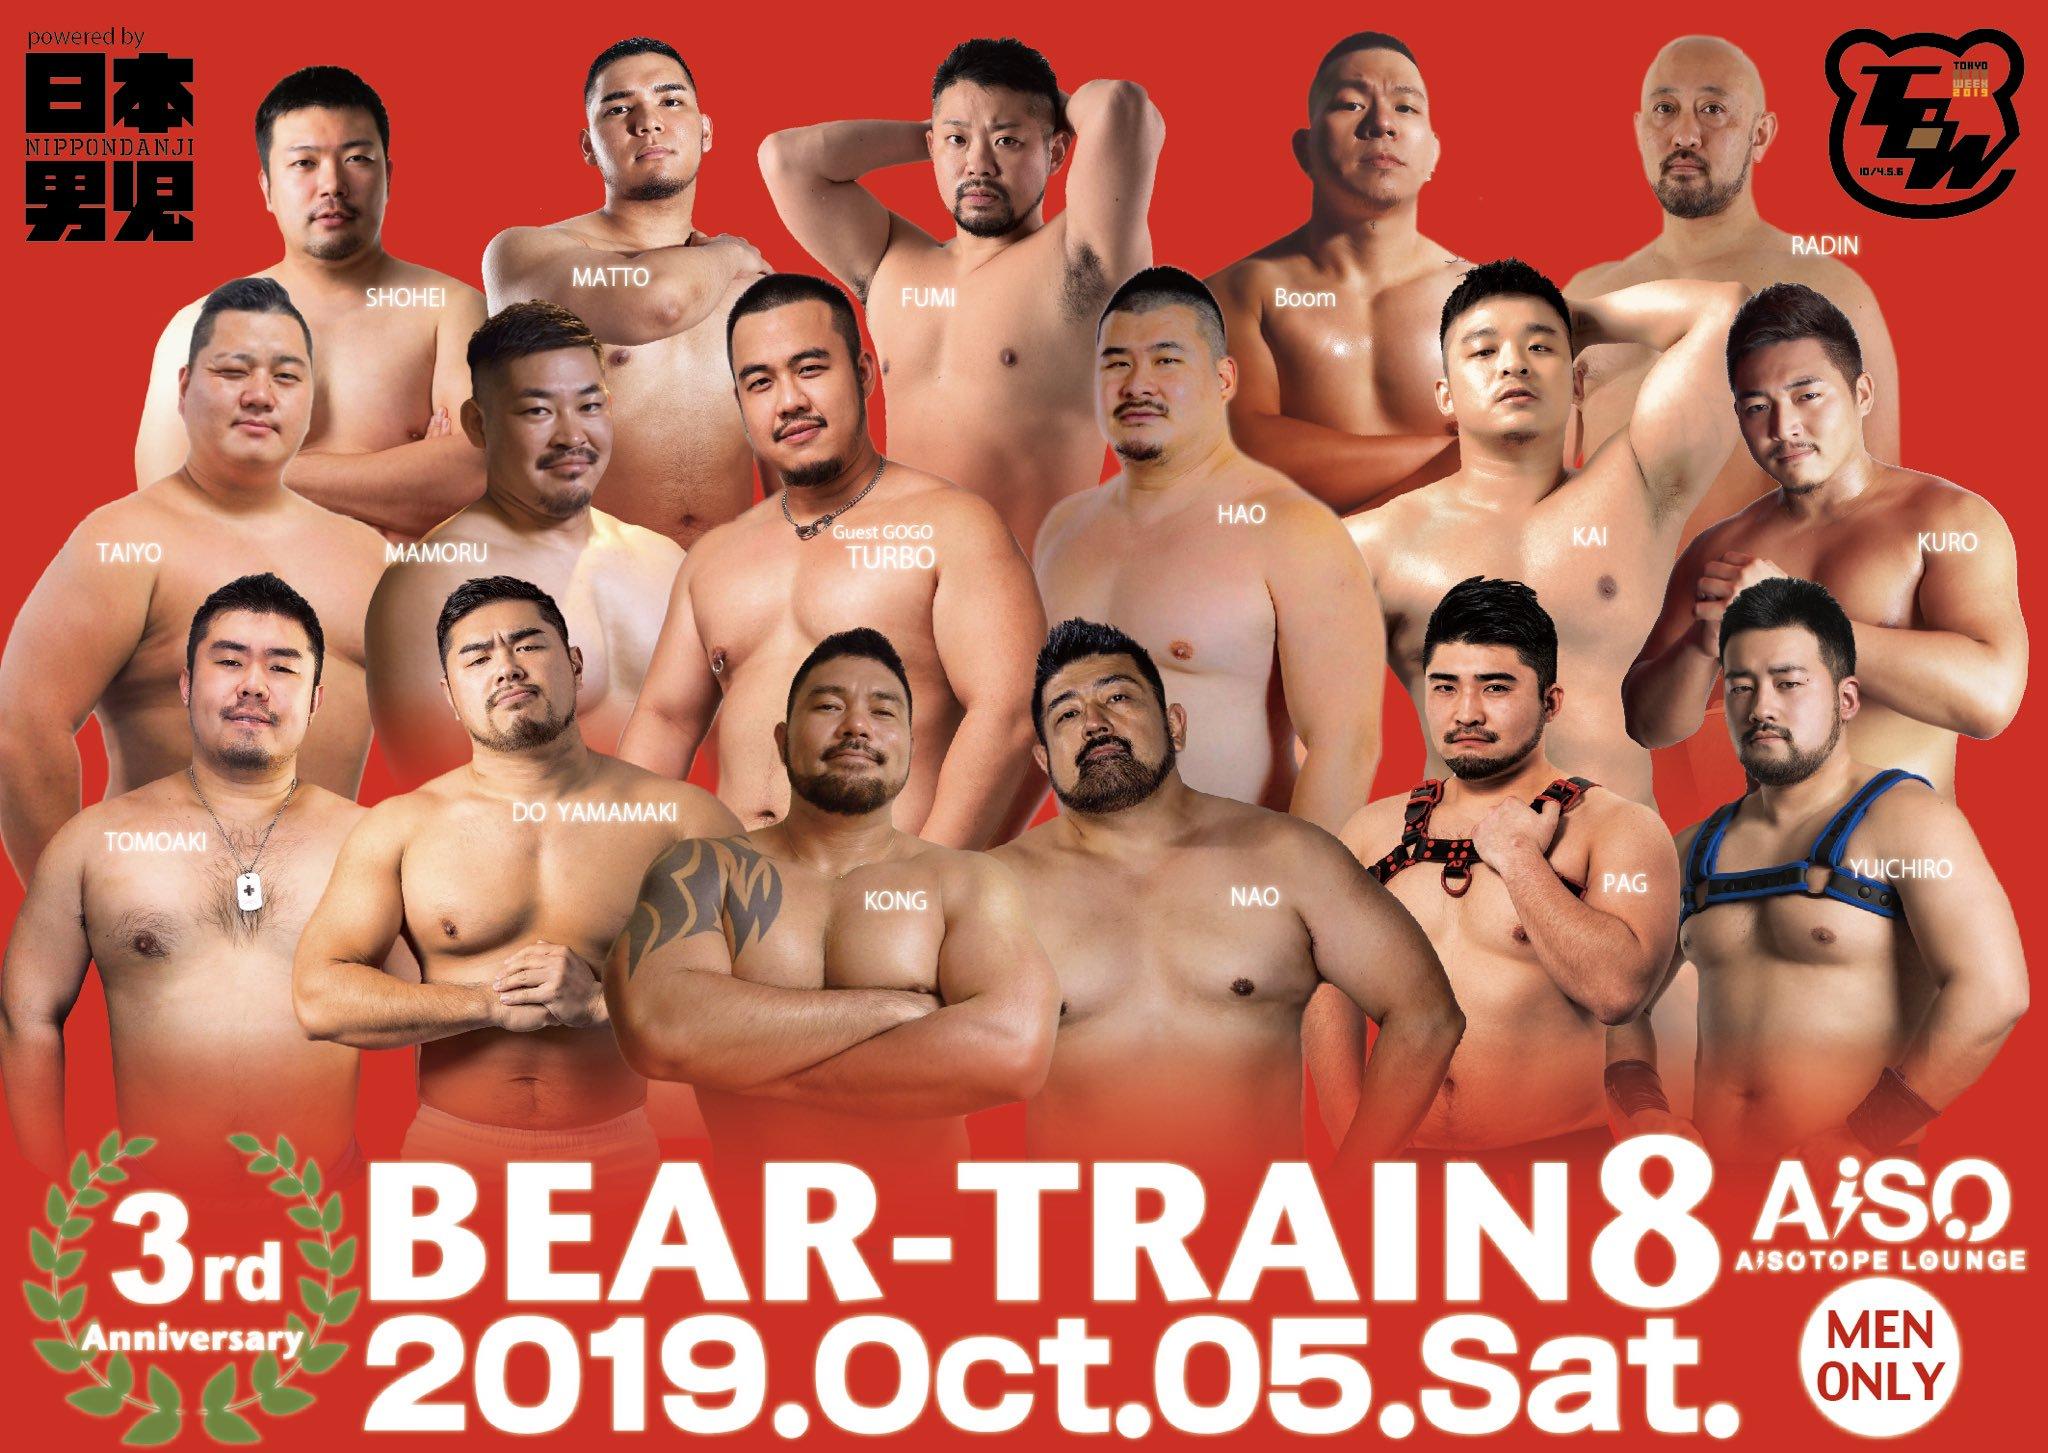 BEAR-TRAIN / TOKYO BEAR WEEK